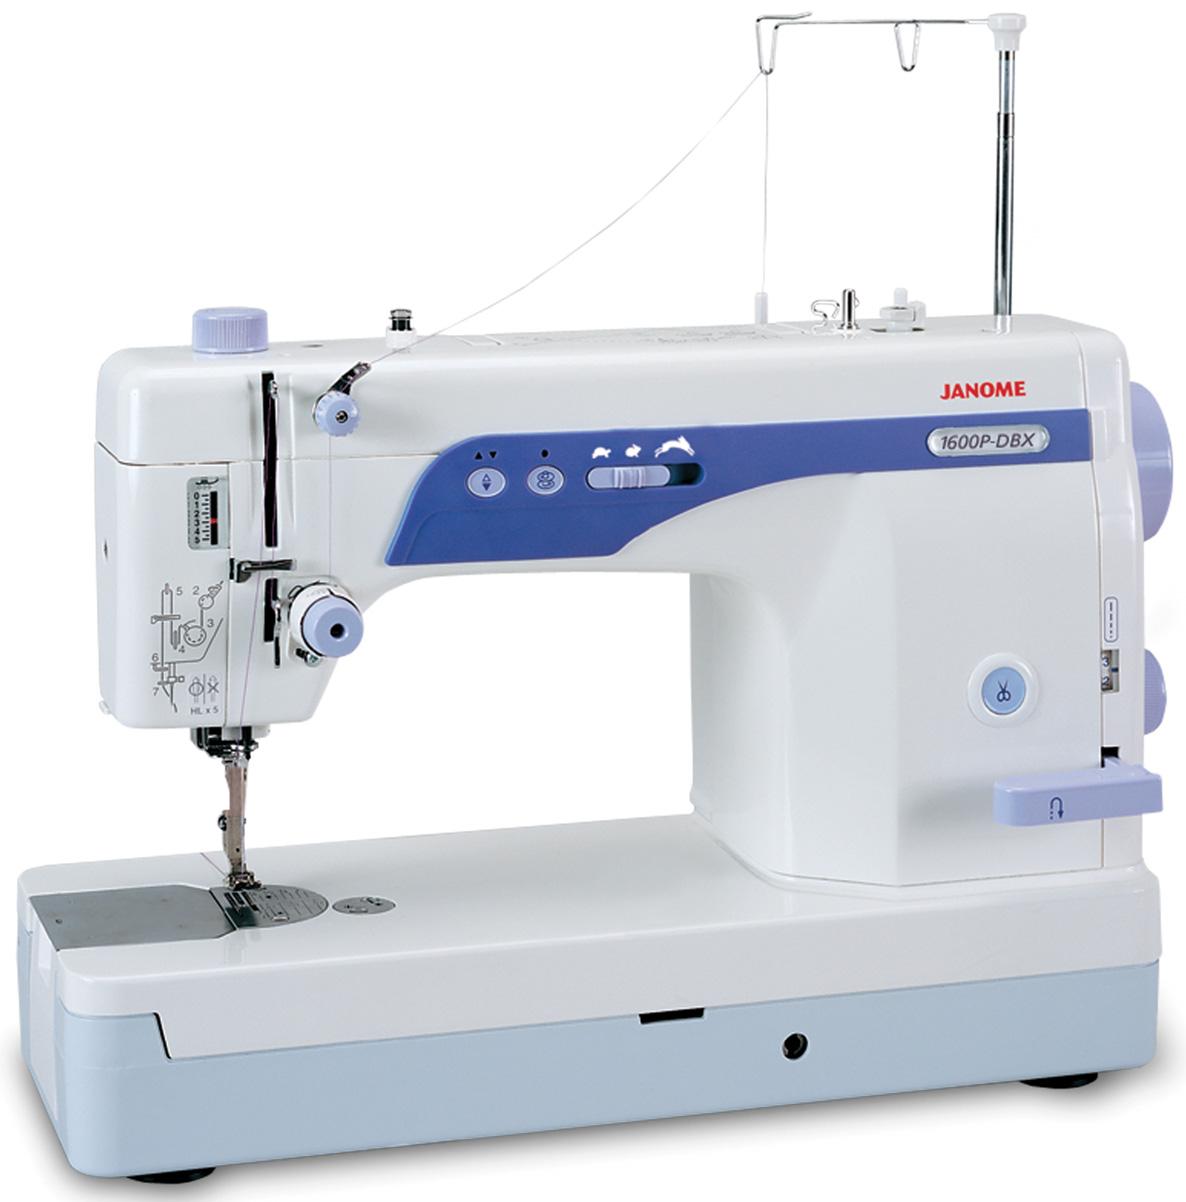 Janome 1600P-DBX High Speed Sewing Machine w/ Sewing Basket, 7 bonus ...